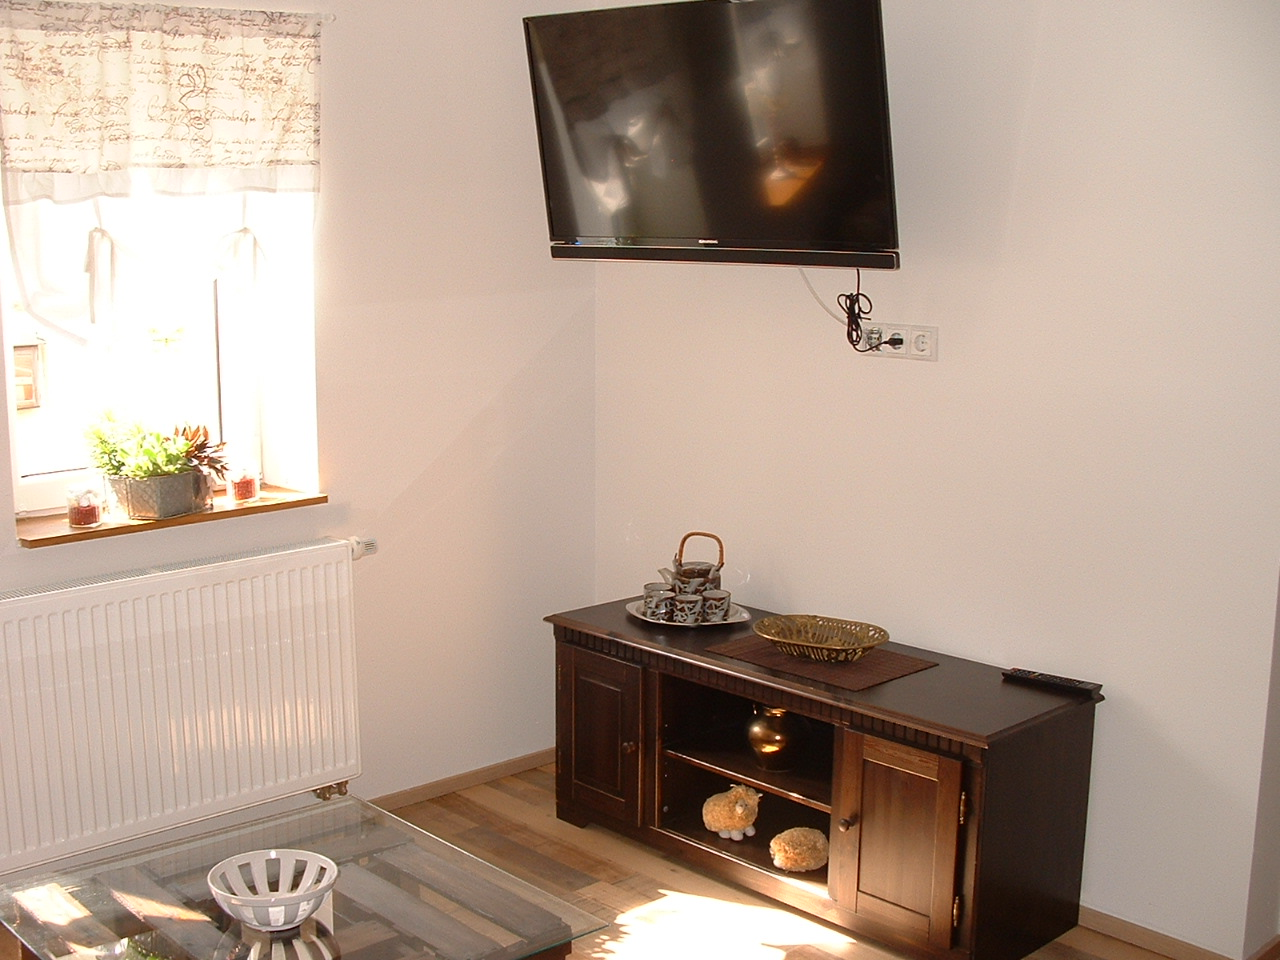 TV-Flachbildschirm mit Phonoboard